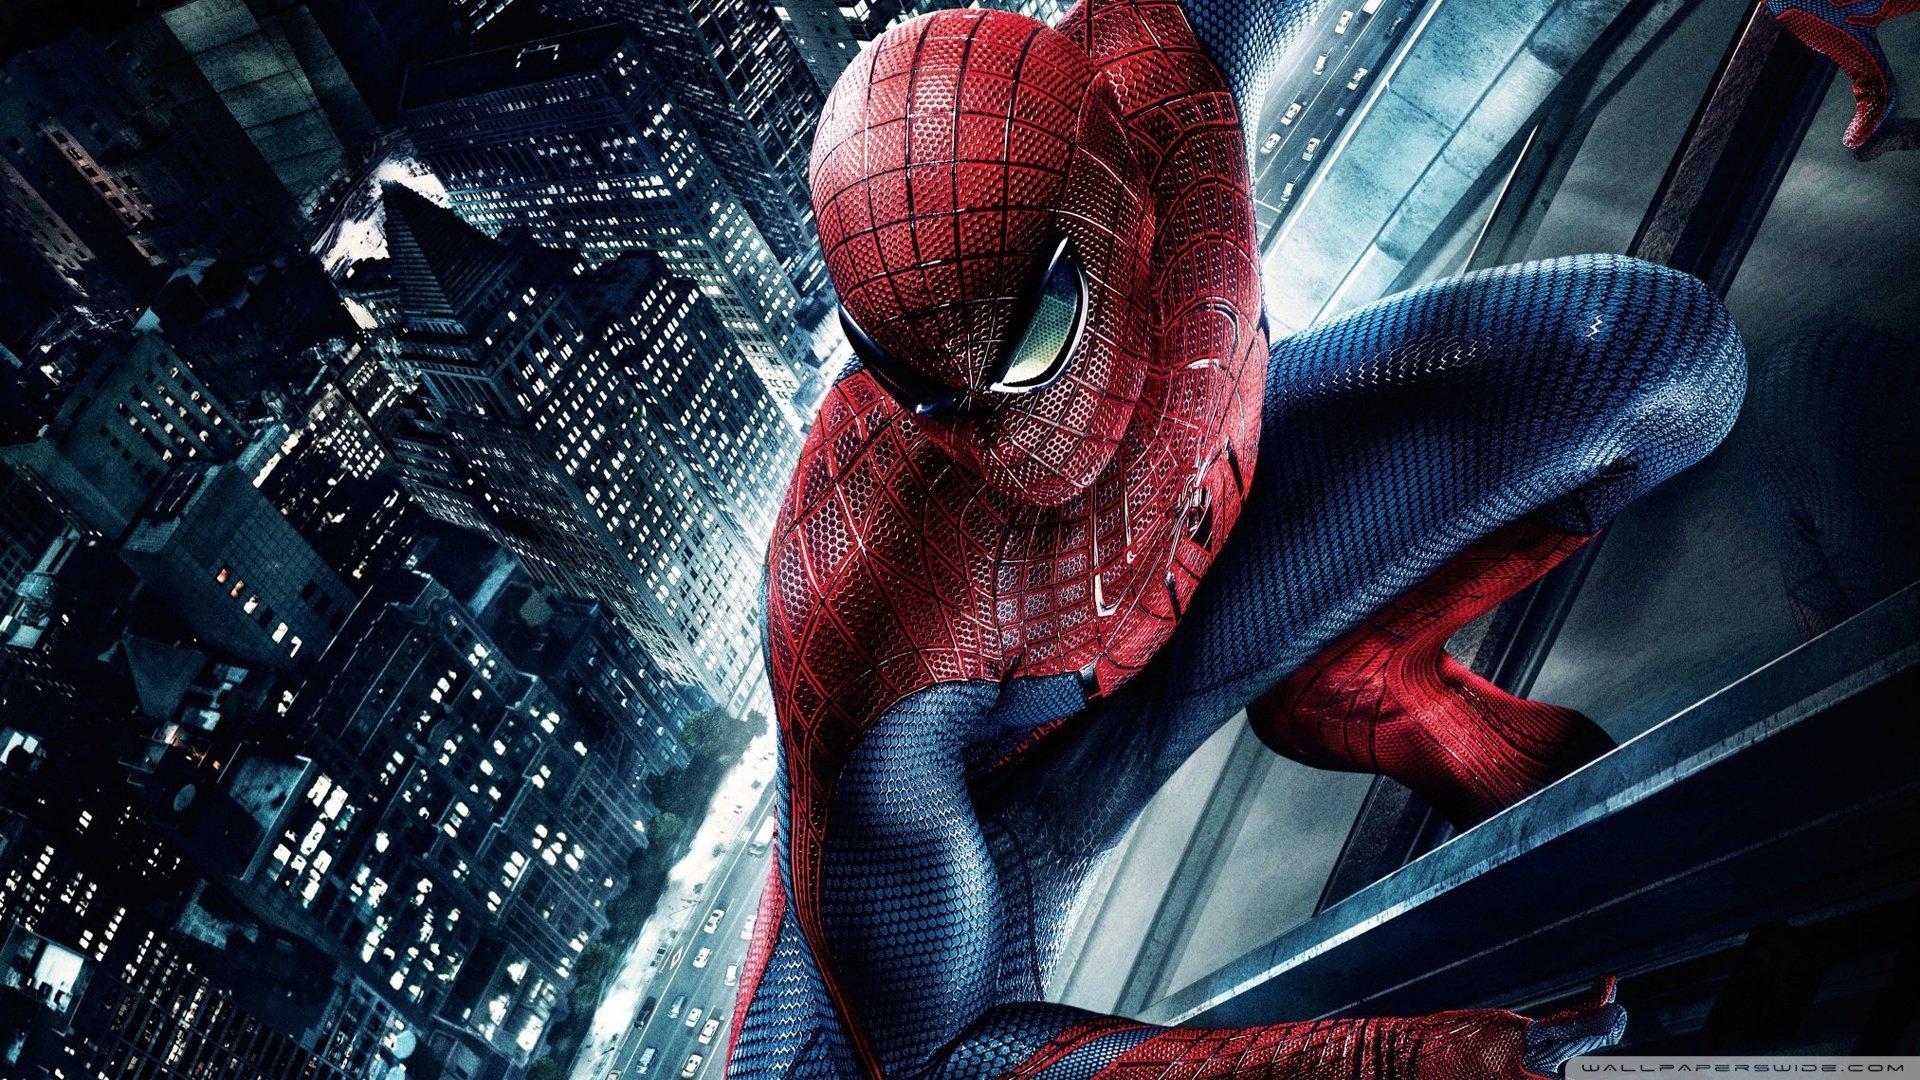 AMAZING SPIDER MAN 2 Action Adventure Fantasy Comics Movie Spider Spiderman Marvel Superhero 40 Wallpaper